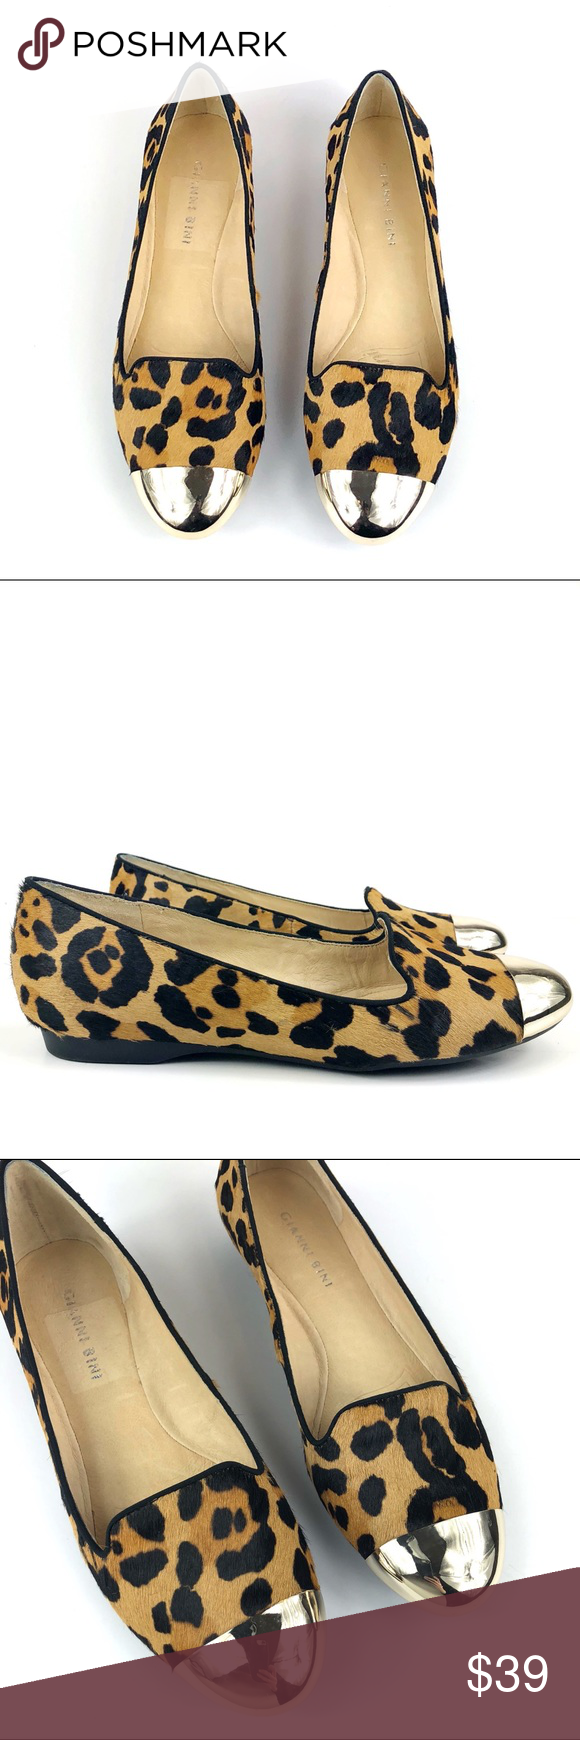 gianni bini leopard flats